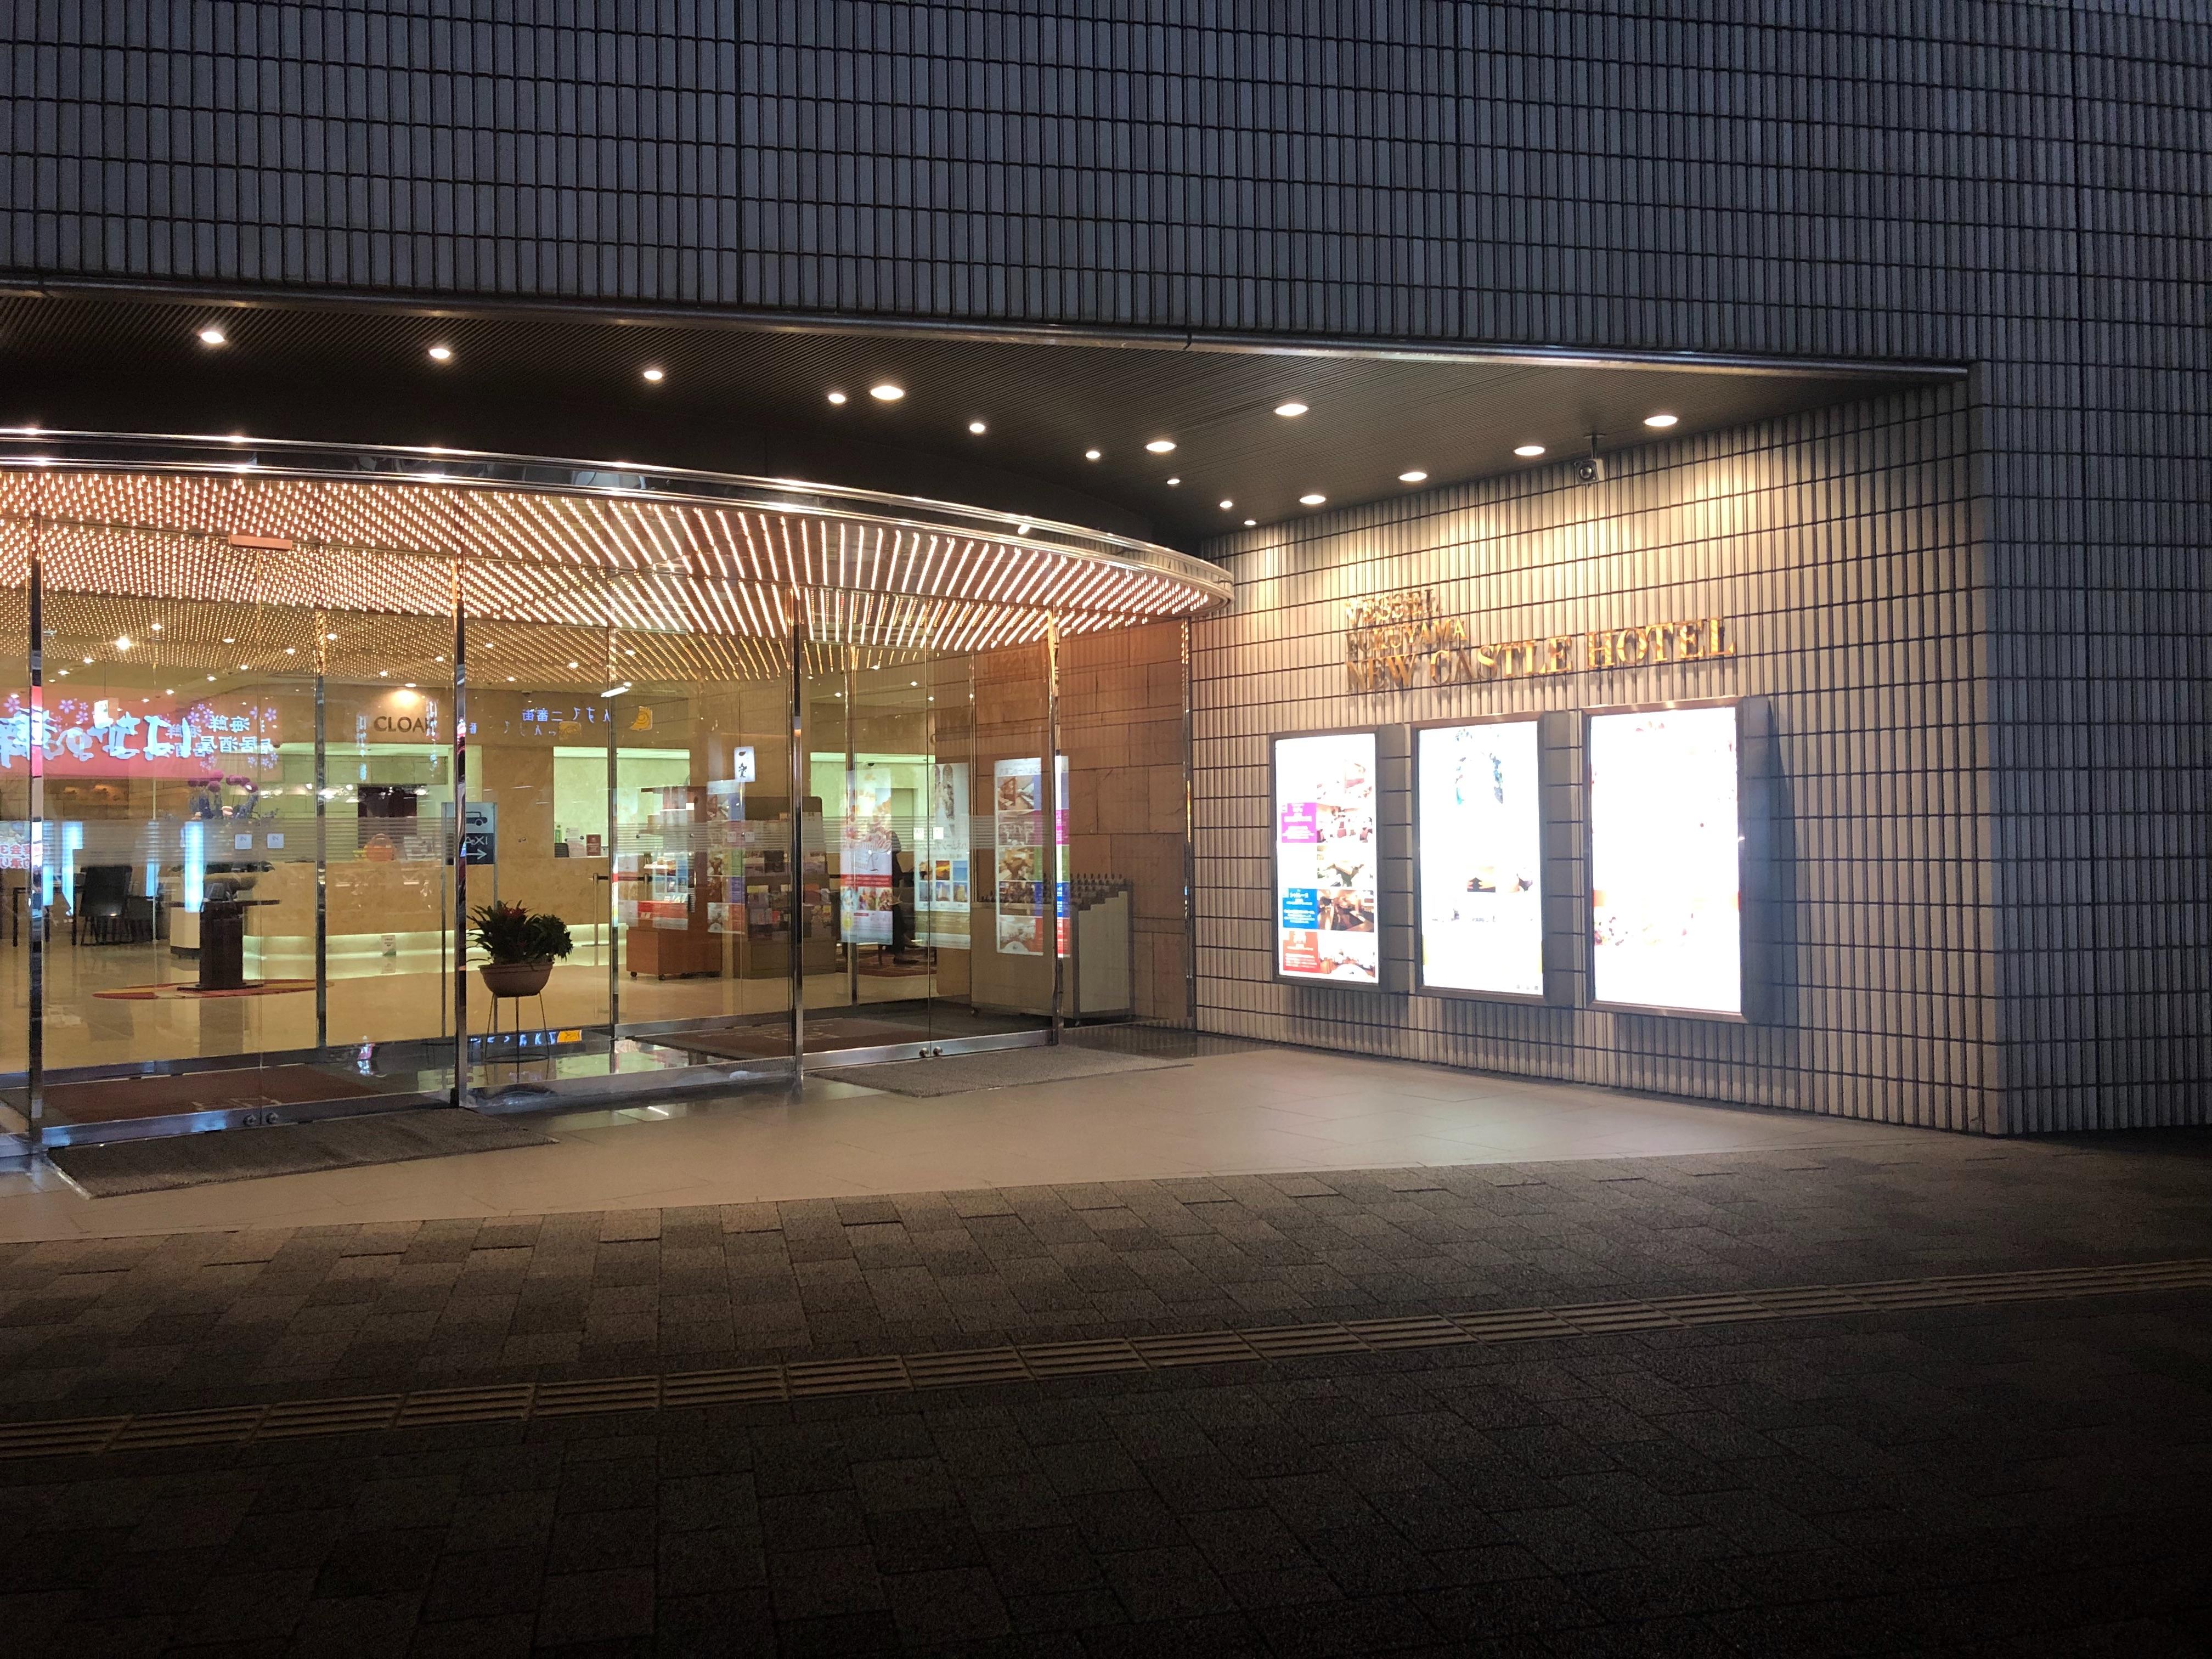 f:id:masanori-kato1972:20190404094638j:image